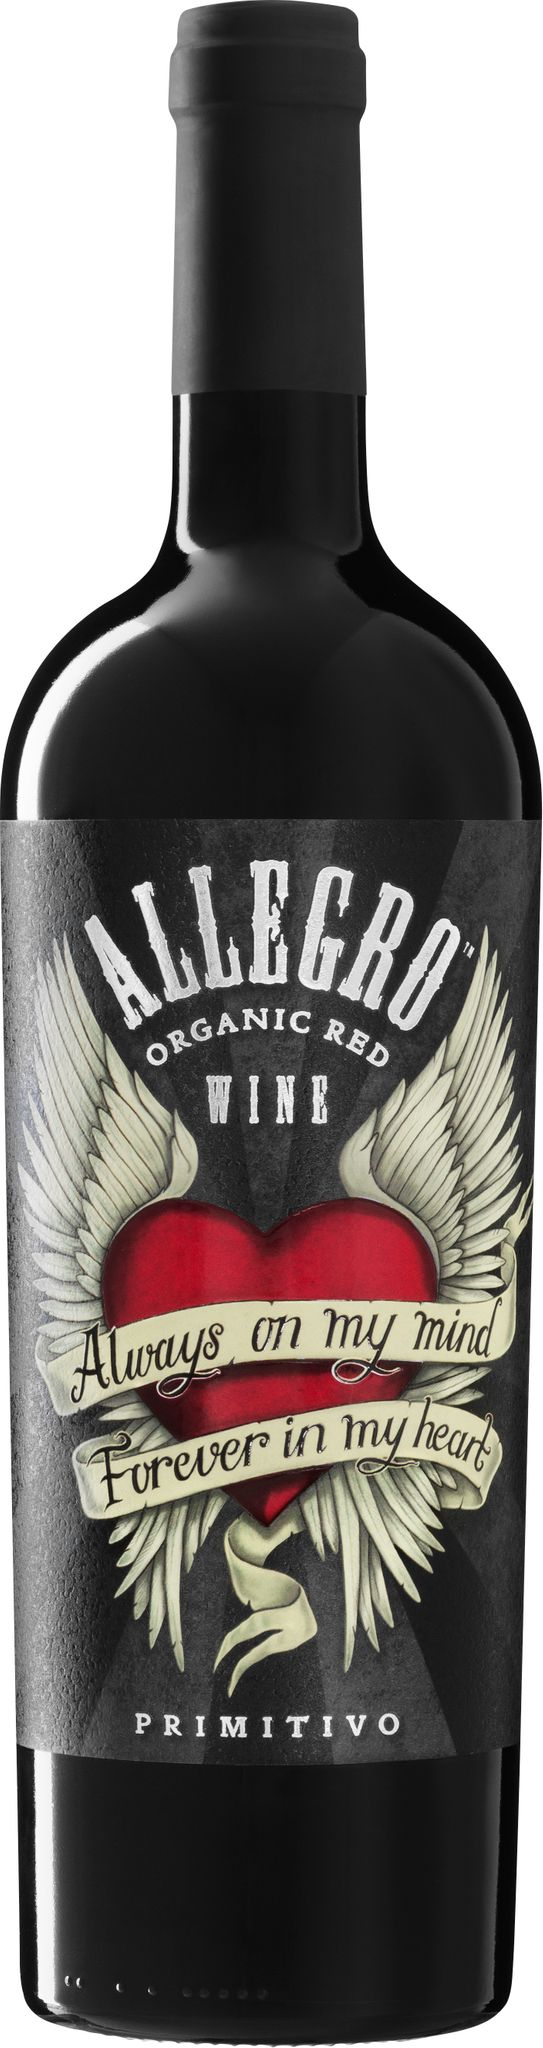 Produktbild på Allegro